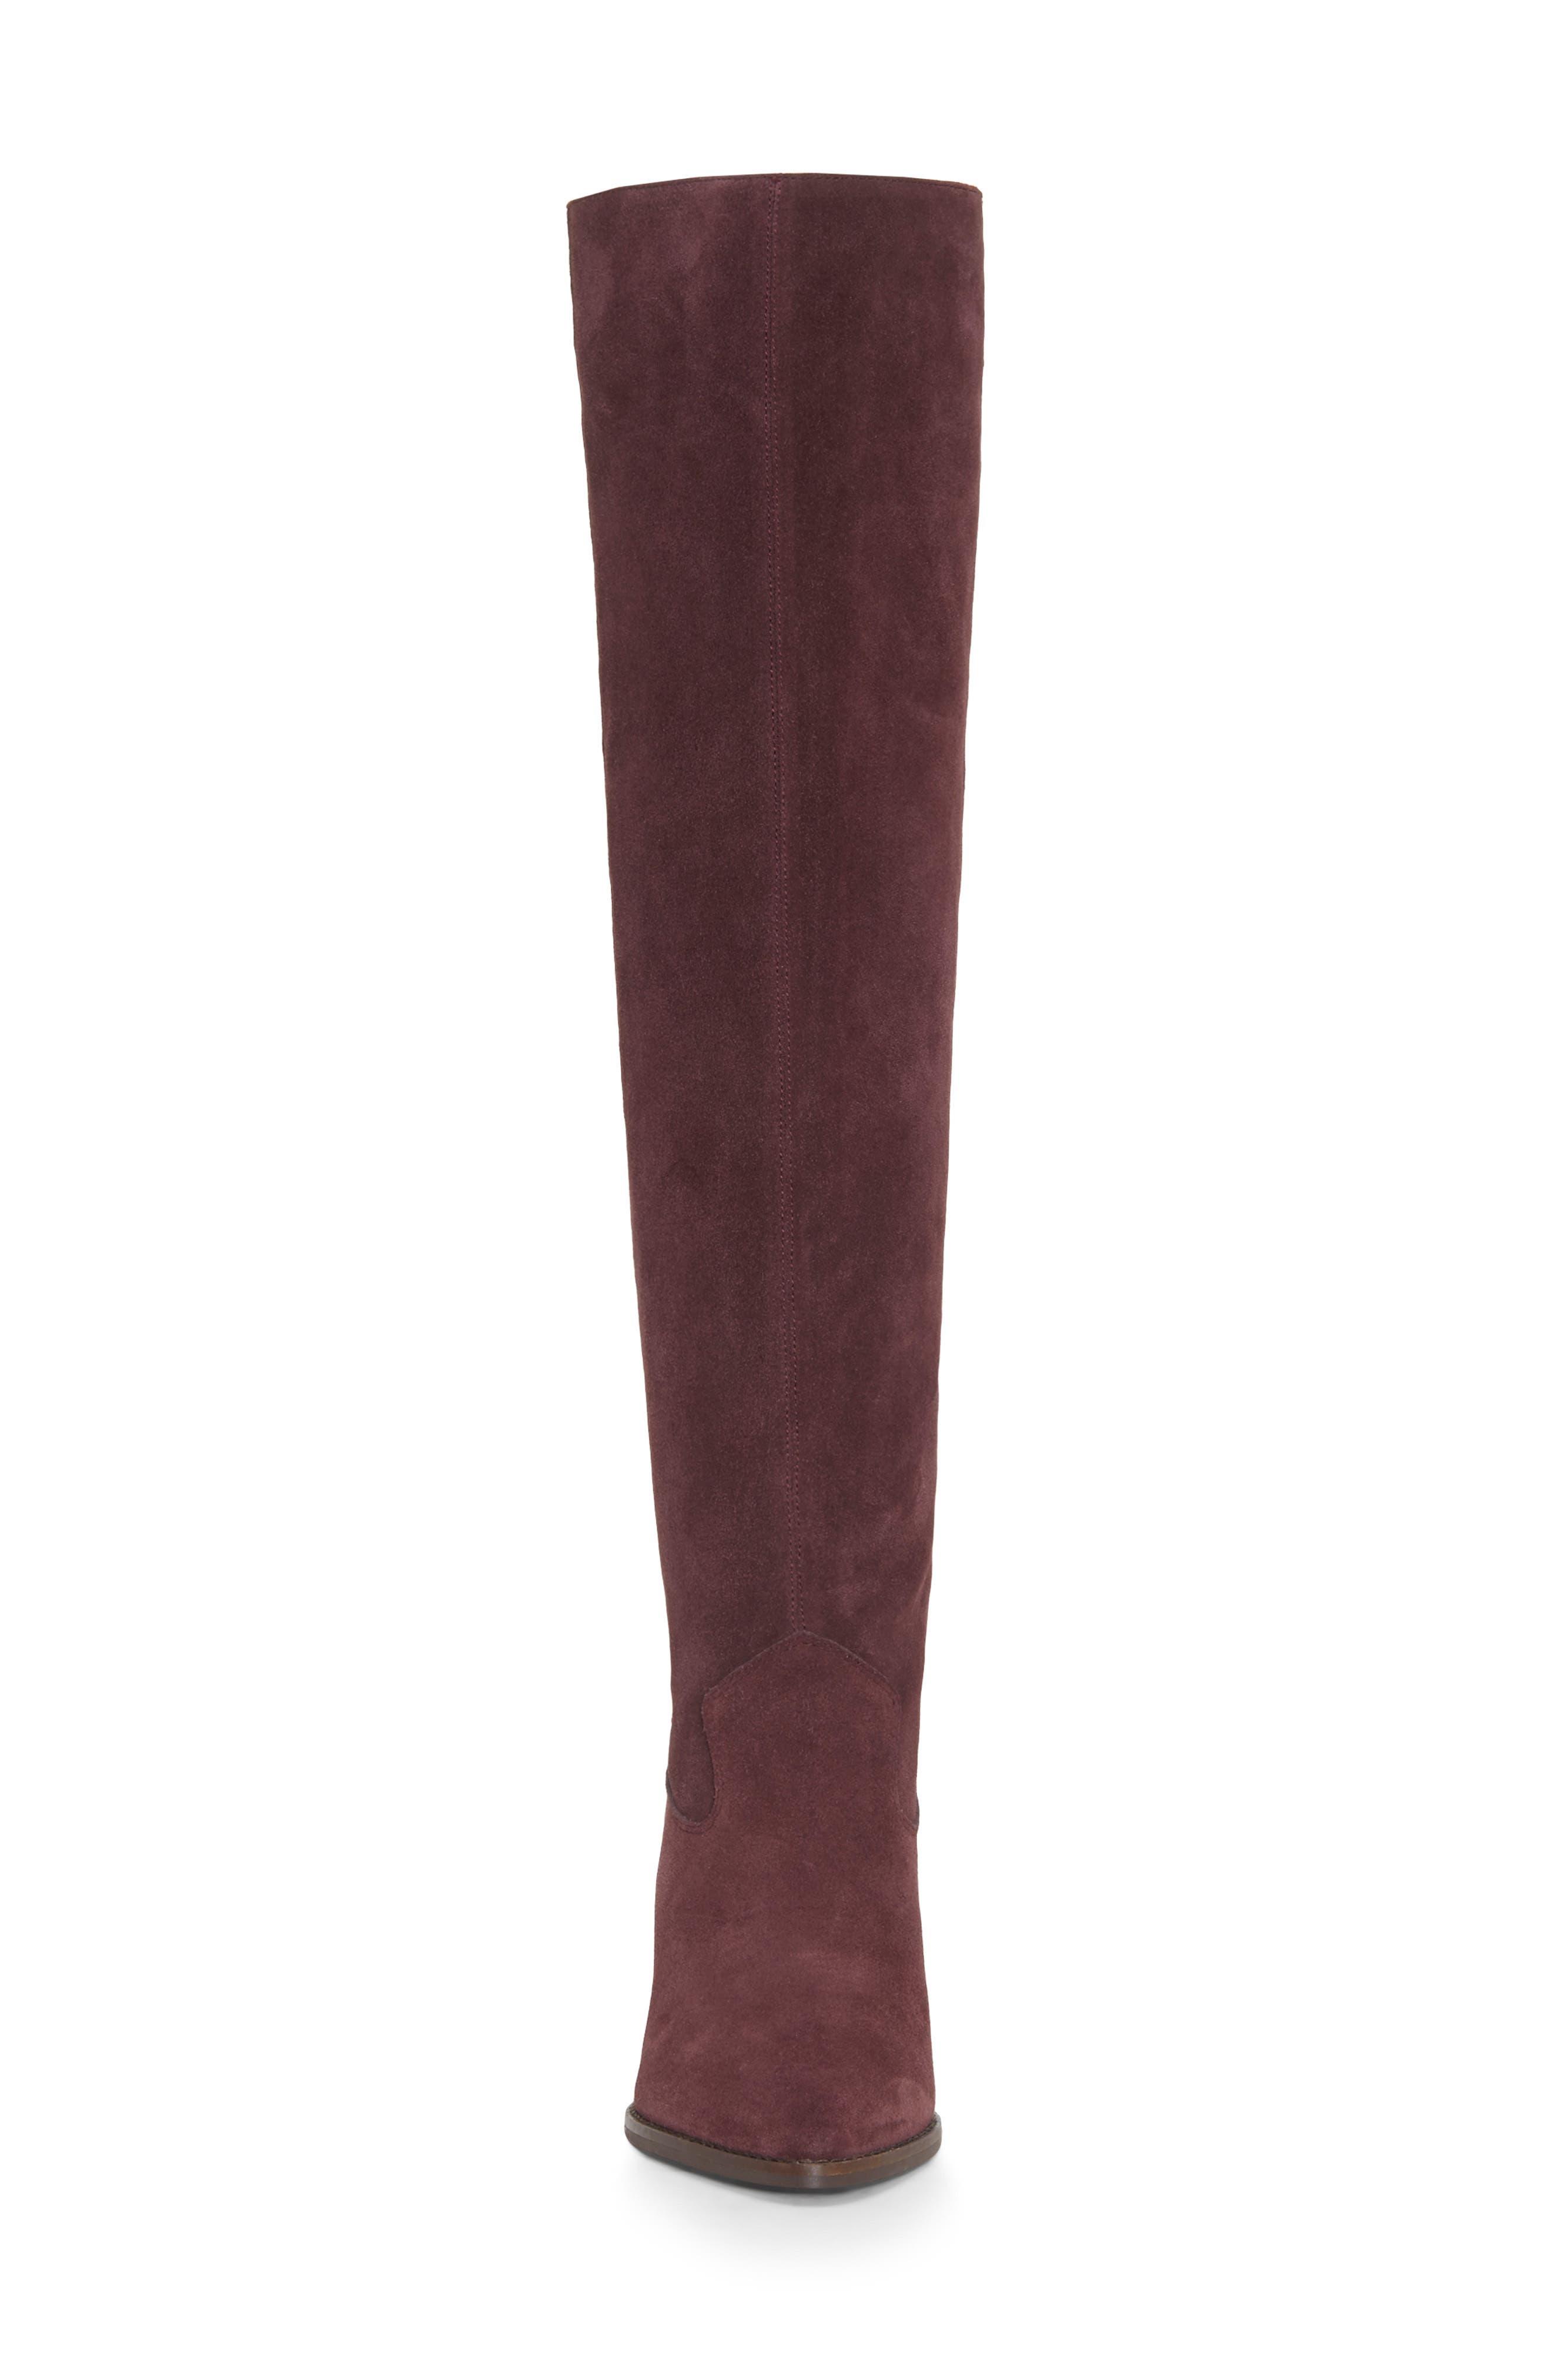 LUCKY BRAND,                             Azoola Knee High Boot,                             Alternate thumbnail 4, color,                             RAISIN SUEDE